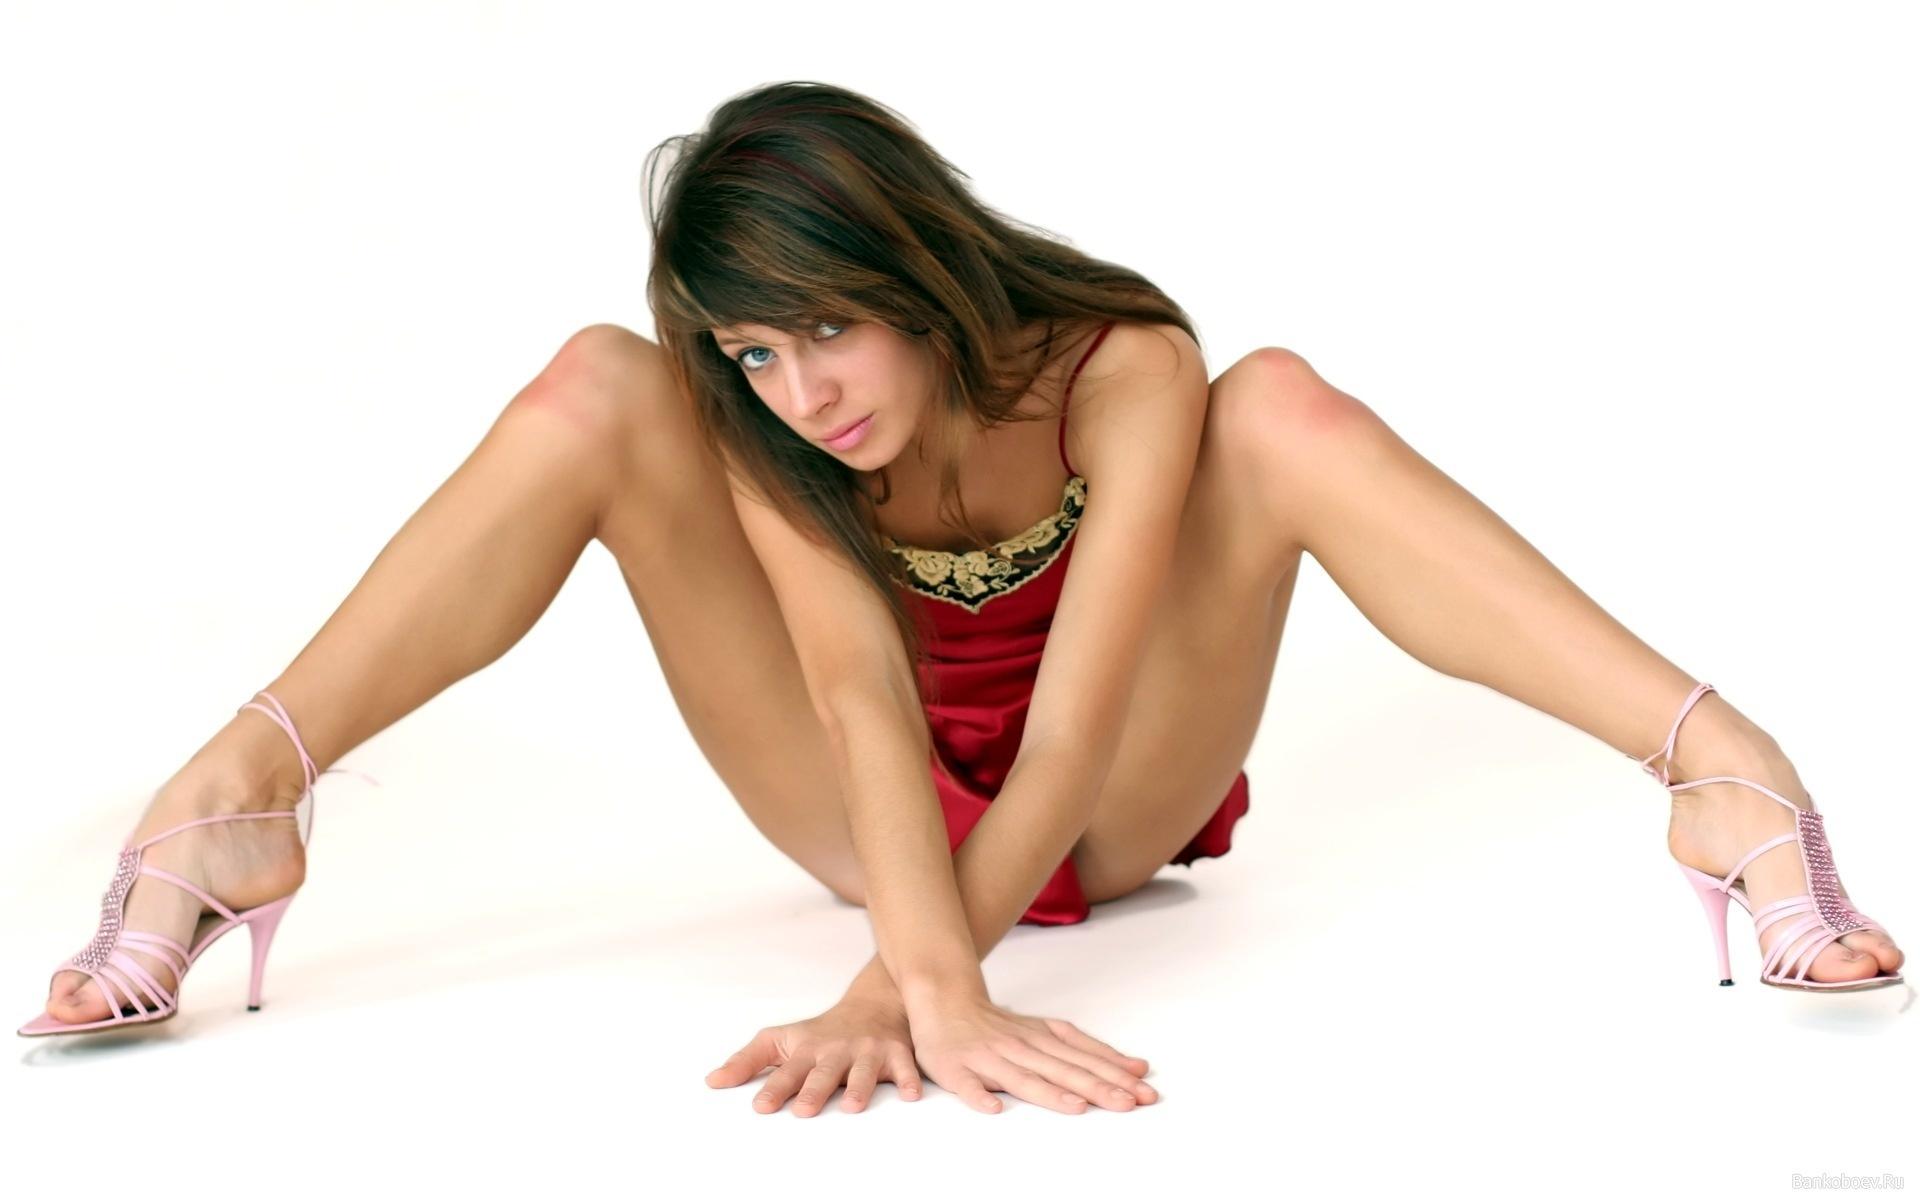 Юная амазонка показала свою бритую киску порно фото